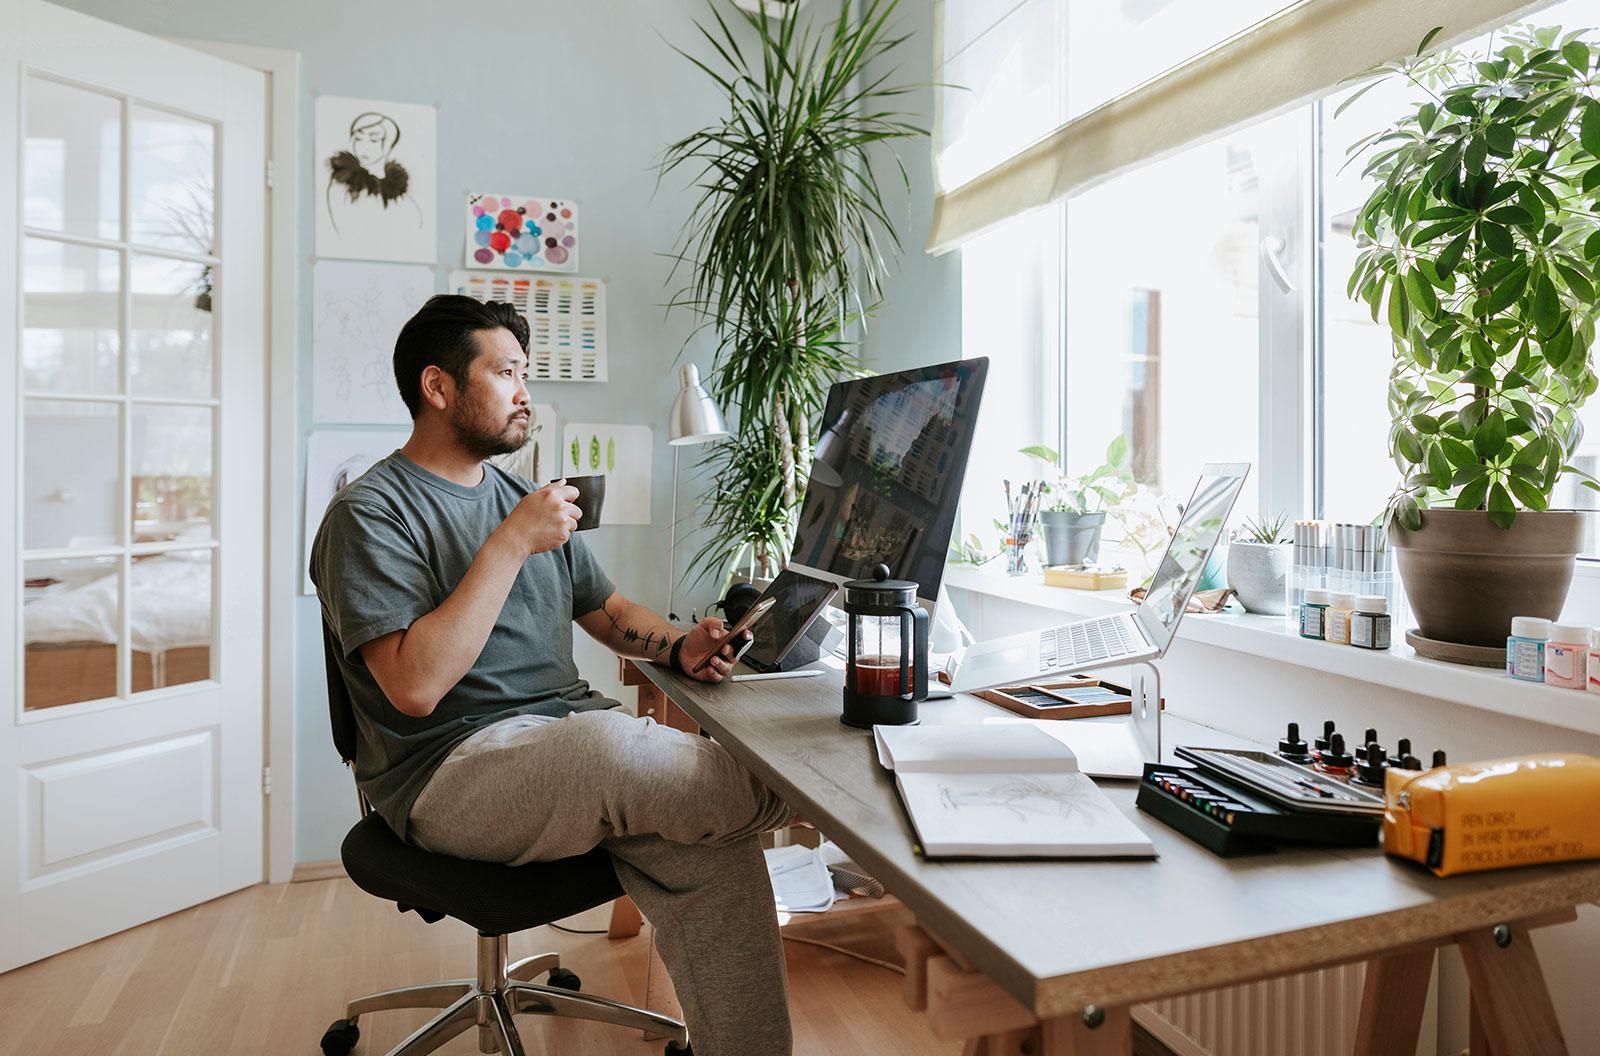 Digital artist contemplates during a coffee break in his home studio